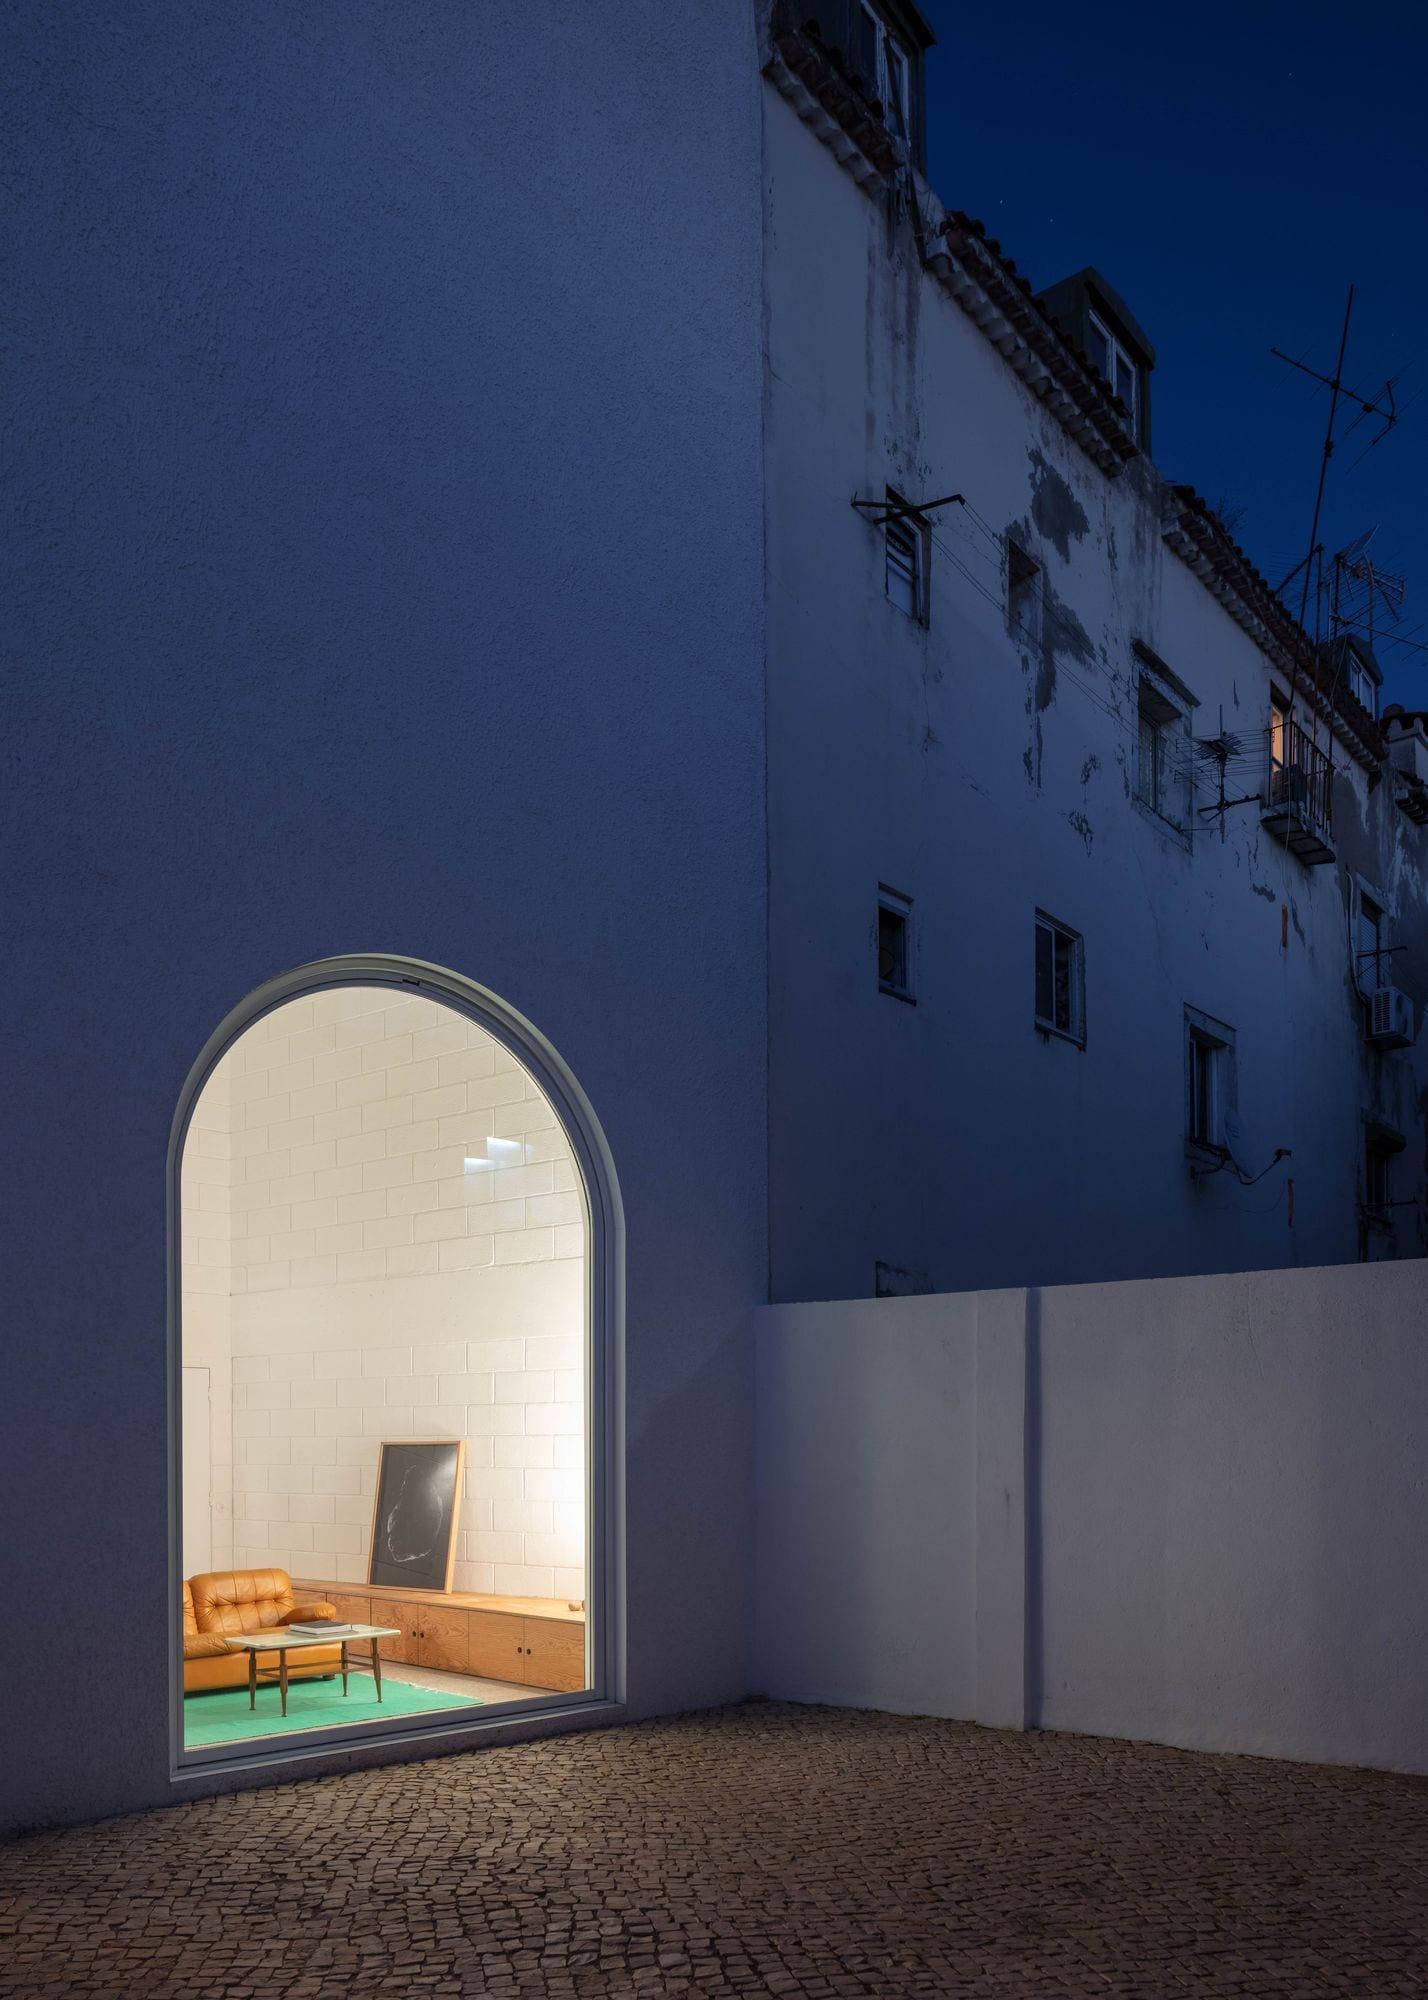 Dodged House In Lisbon By Leopold Banchini Daniel Zamarbide | Yellowtrace